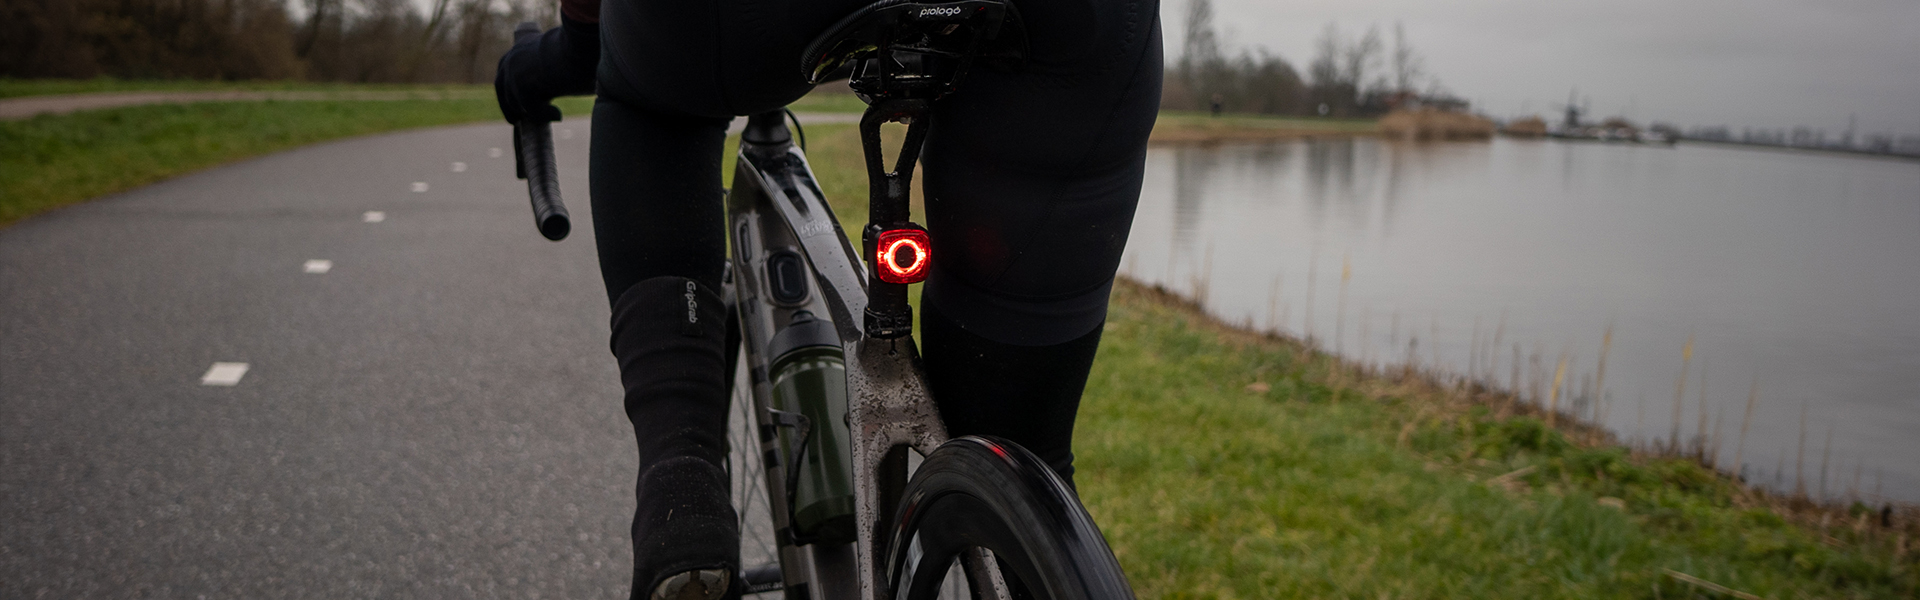 Sate-lite CREE ebike light  StVZO TPRBi eletric bike tail light with Z ECE reflector  mount on Carrier 6-48V